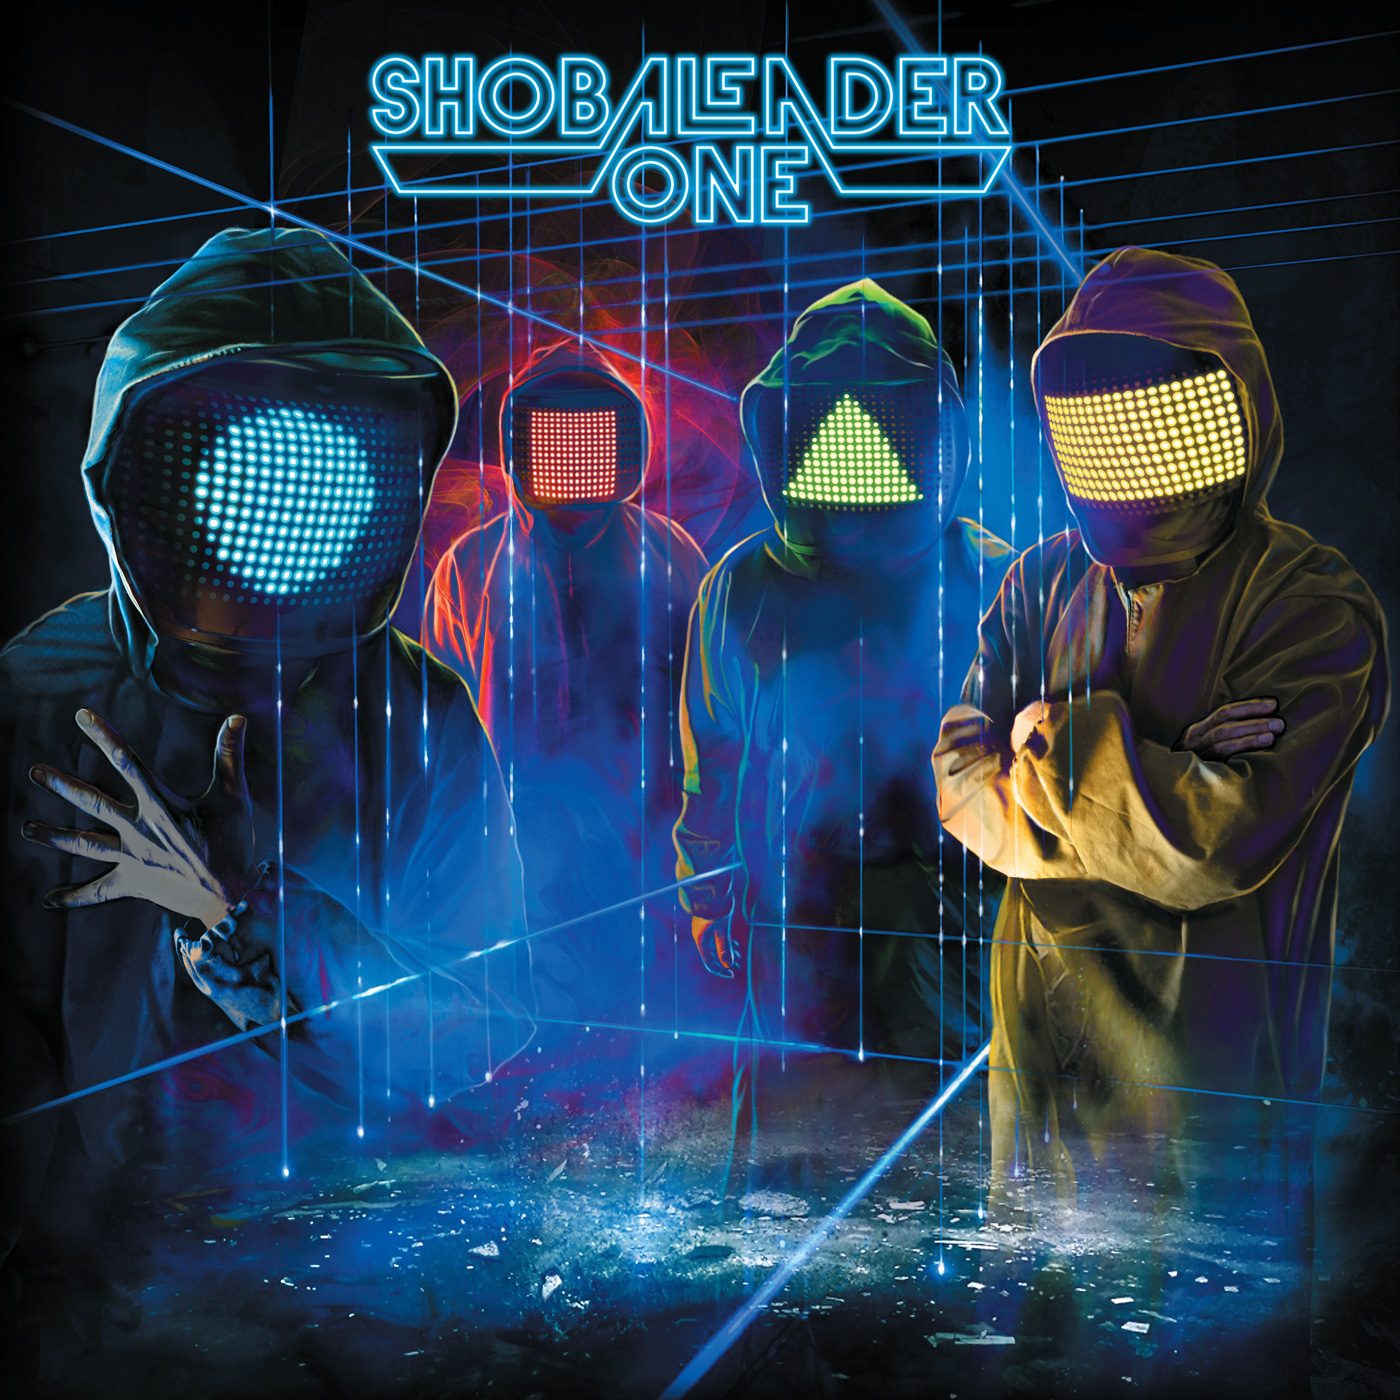 13. Shobaleader One - Electrak